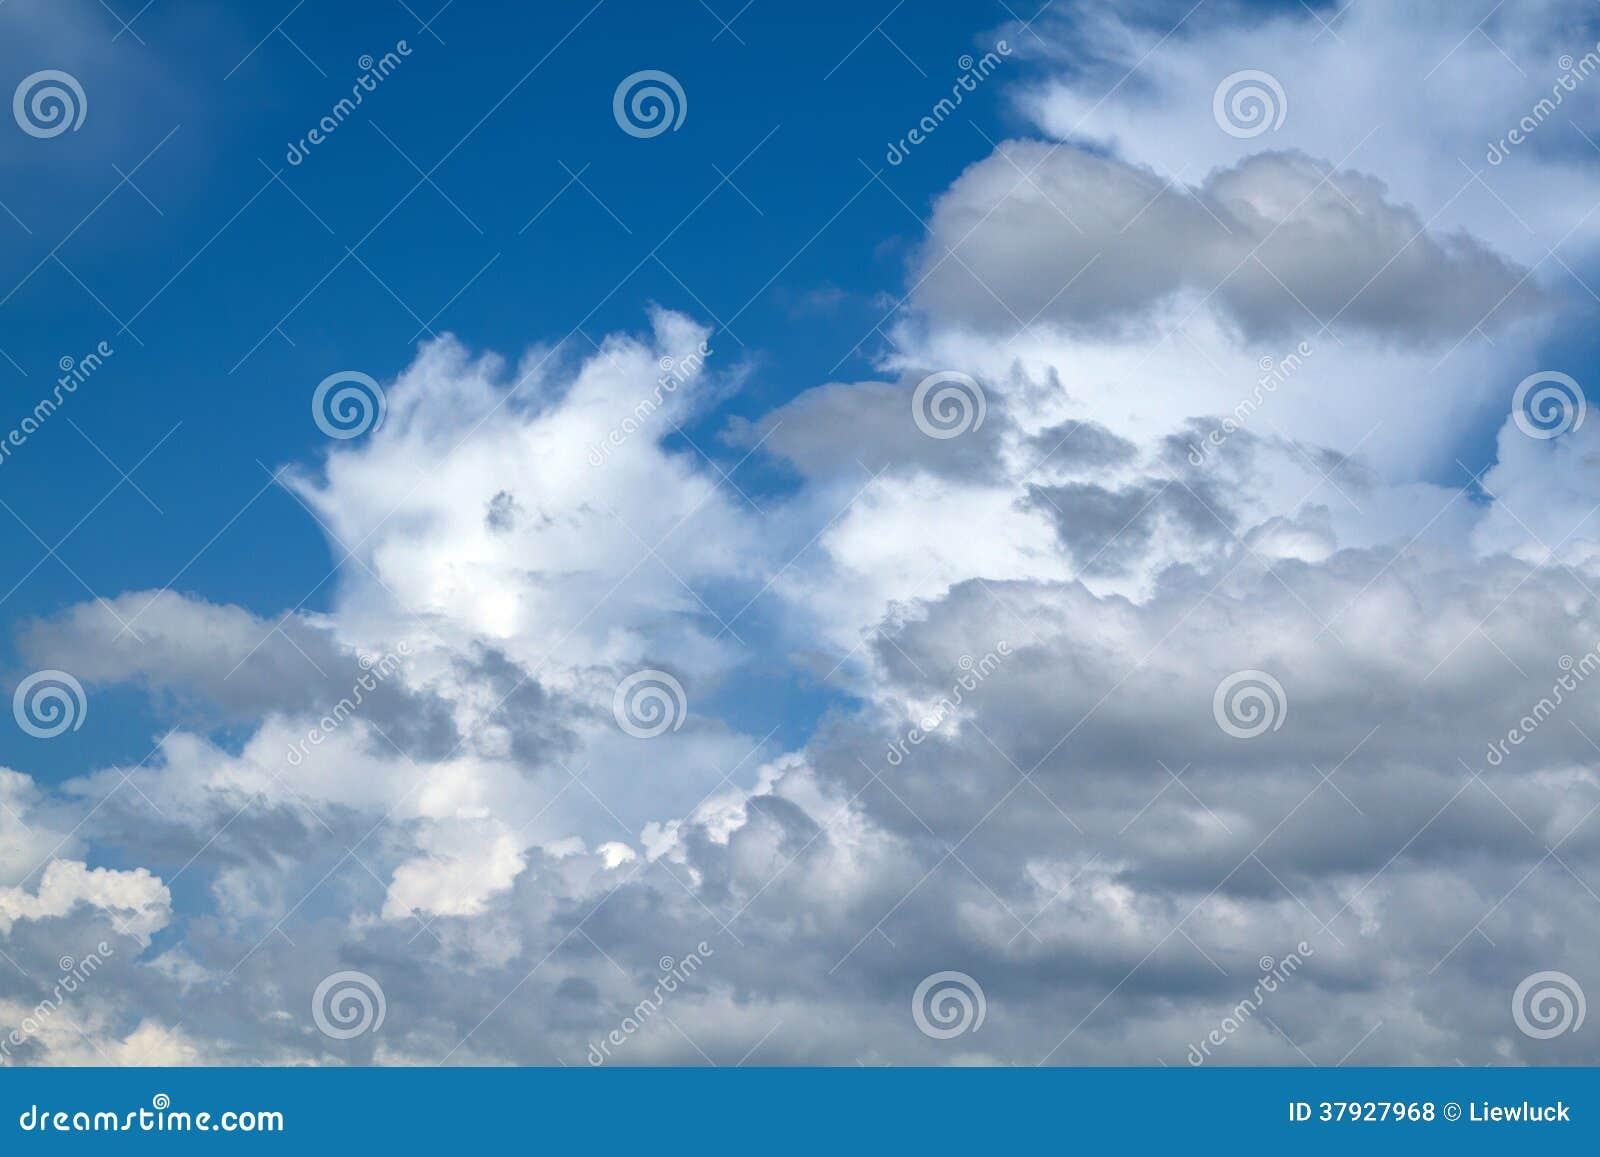 Предпосылка голубого неба